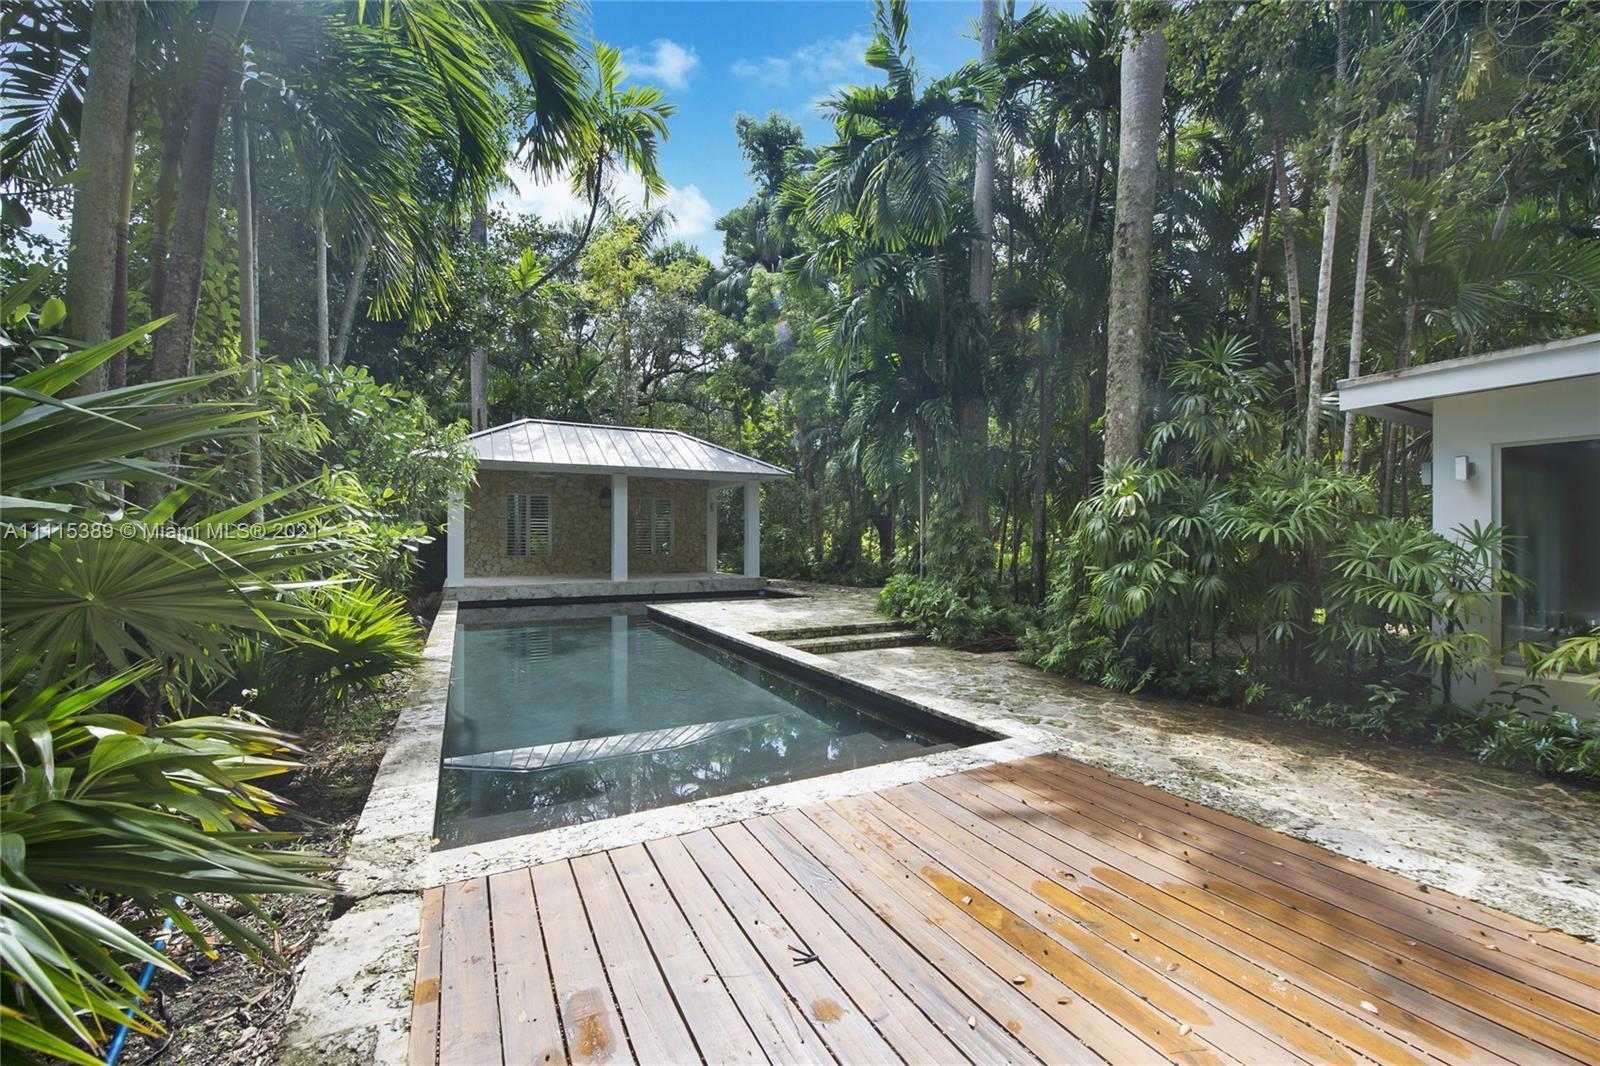 Single Family Home,For Sale,5671 Banyan Trl, Coral Gables, Florida 33156,Brickell,realty,broker,condos near me